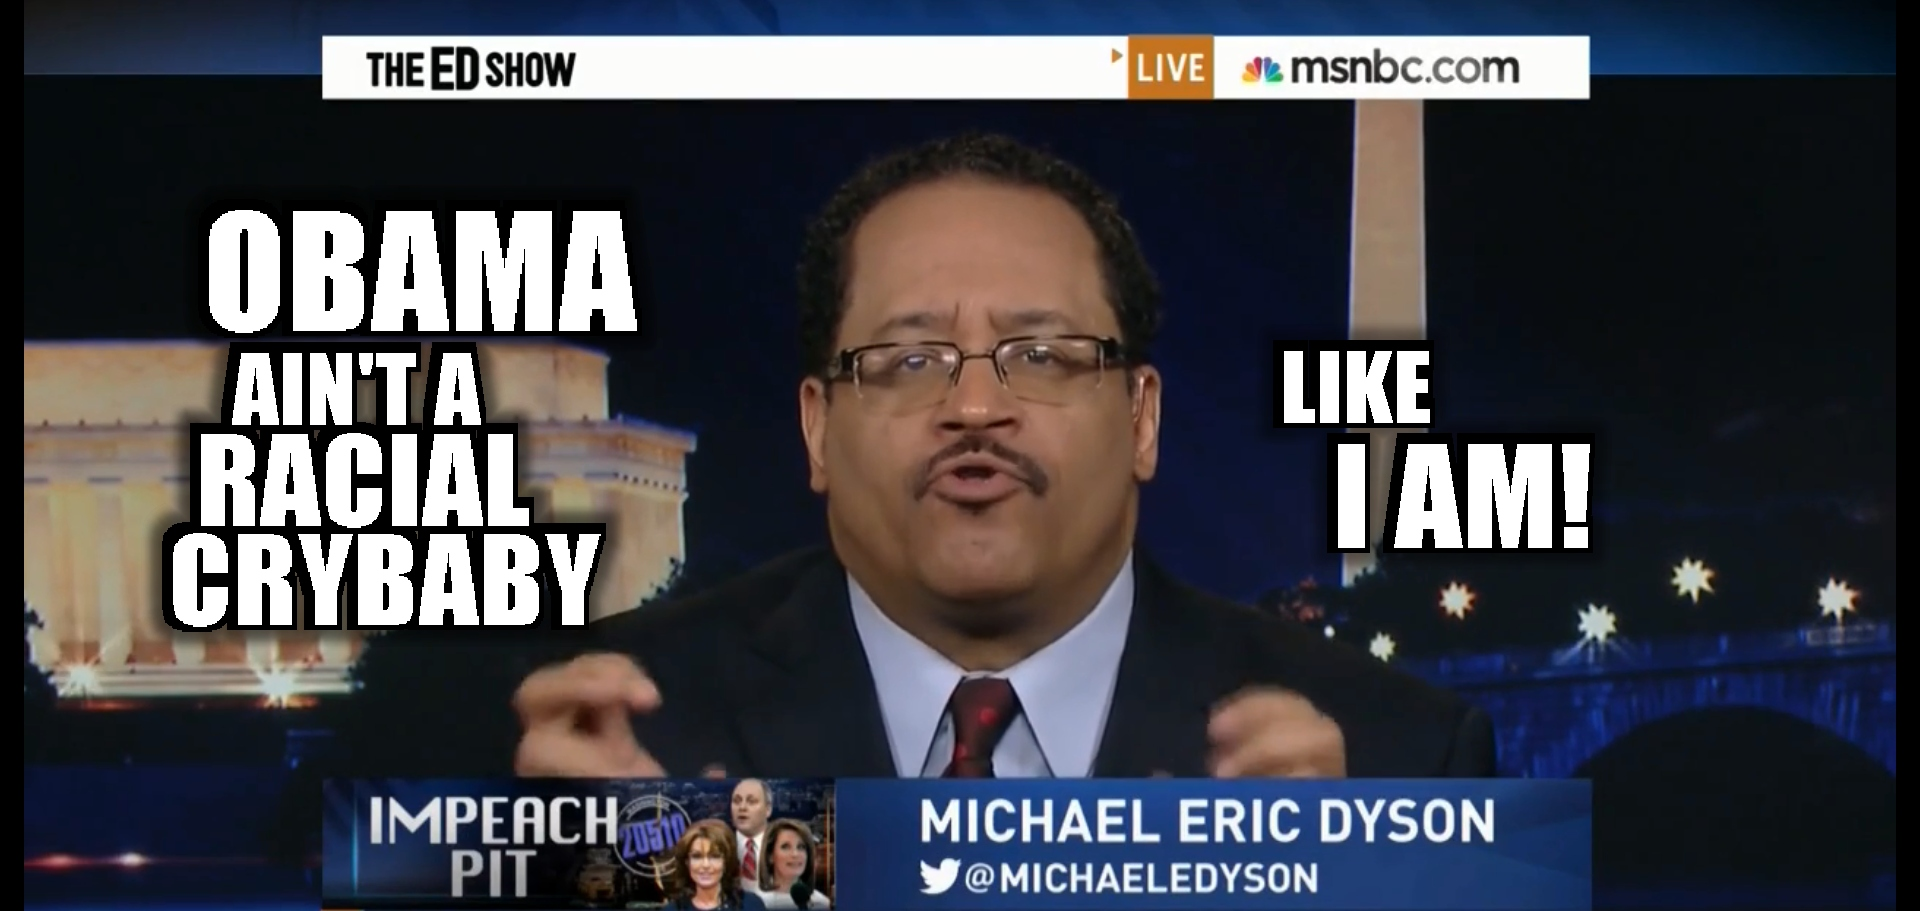 michael eric dyson - RACIAL CRYBABY